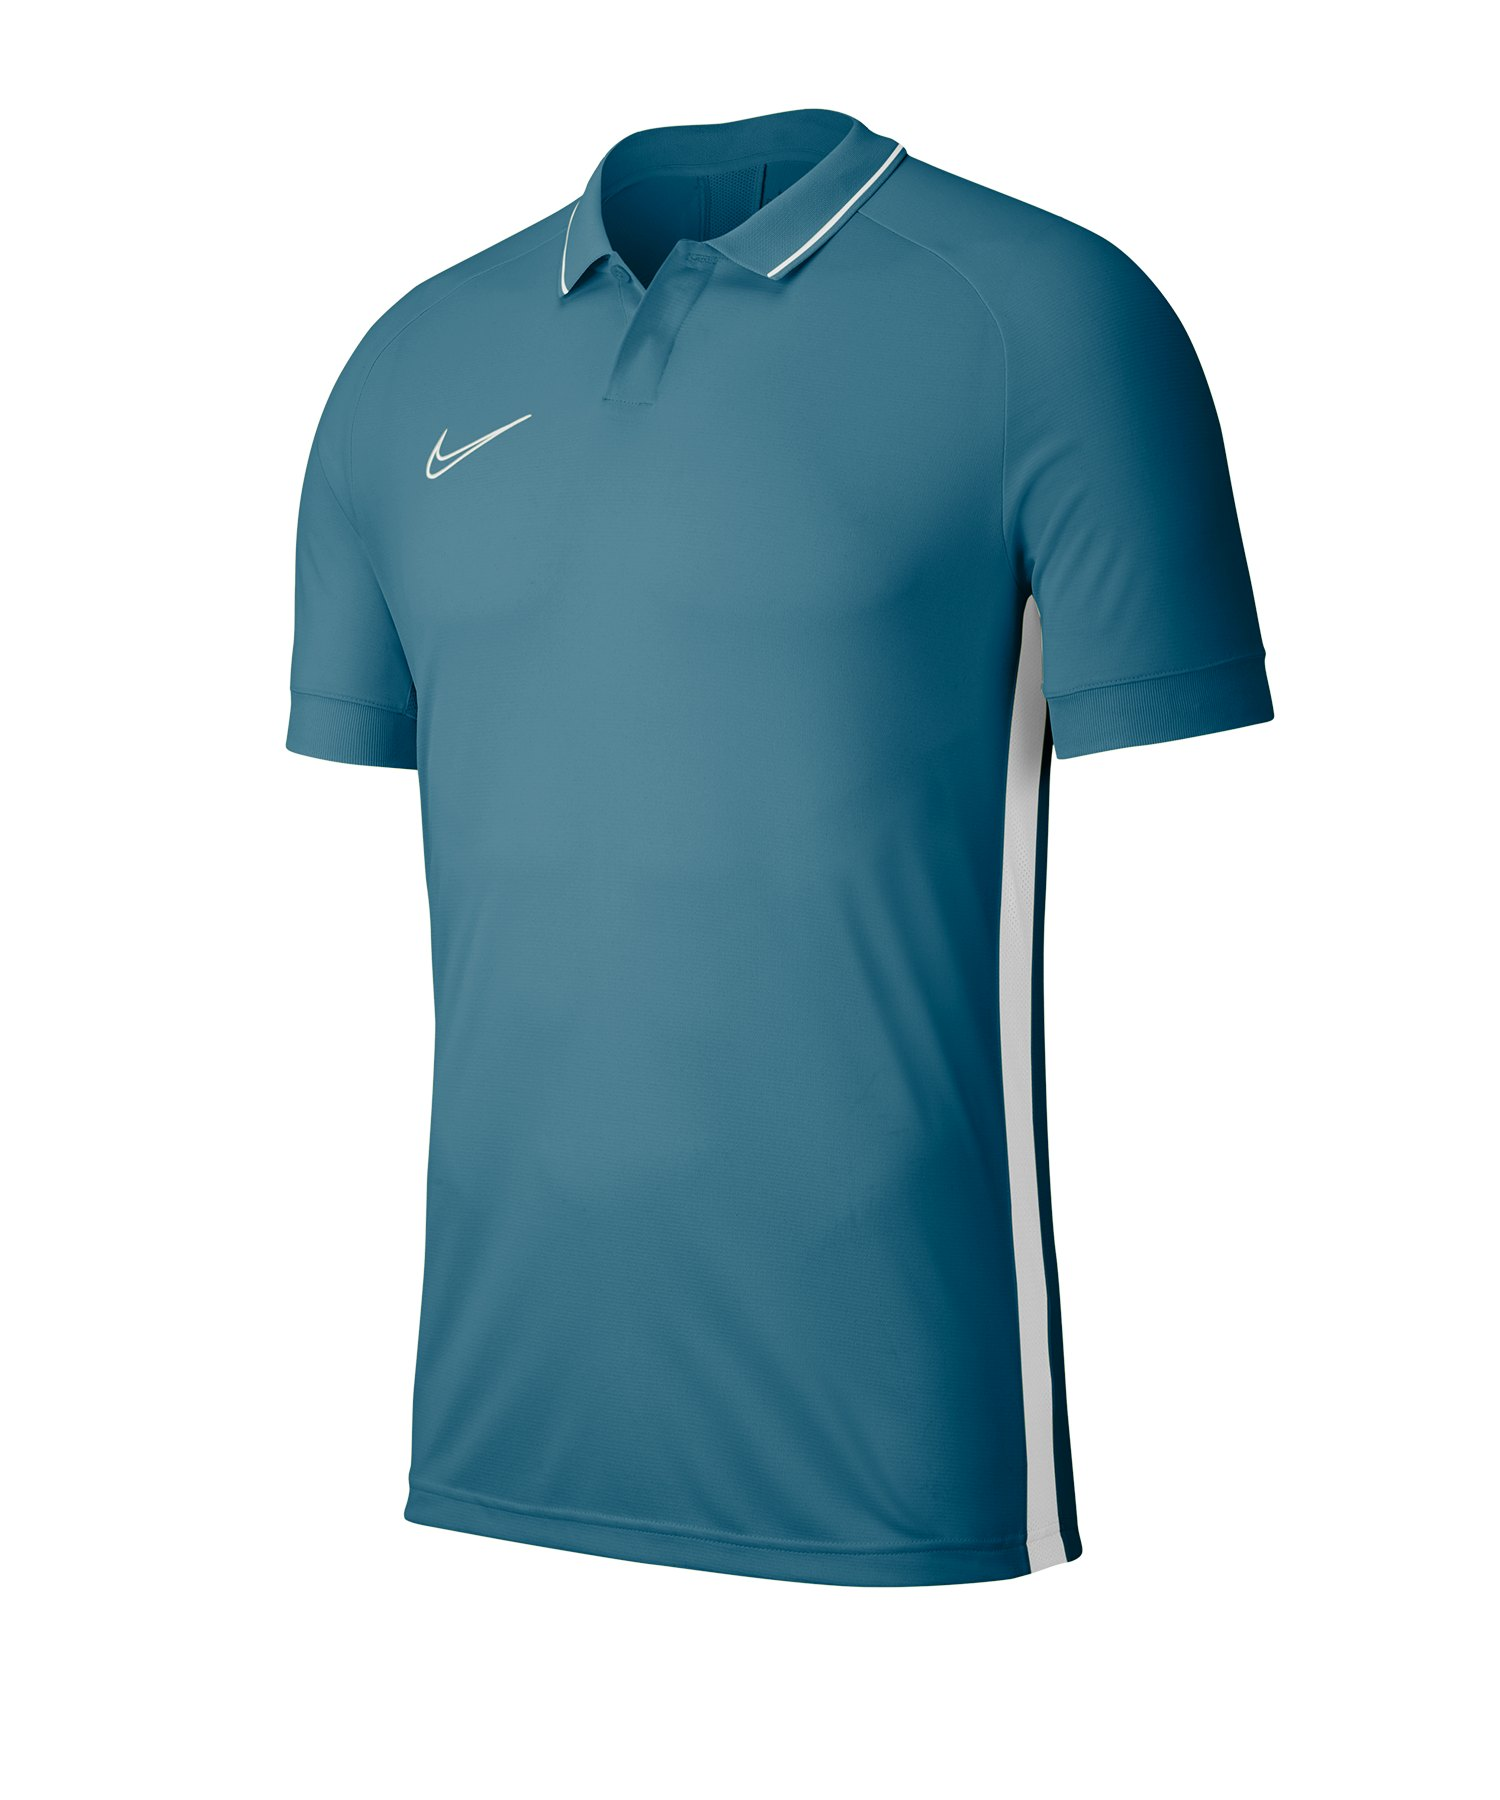 Nike Academy 19 Poloshirt Kids Blau F404 - tuerkis